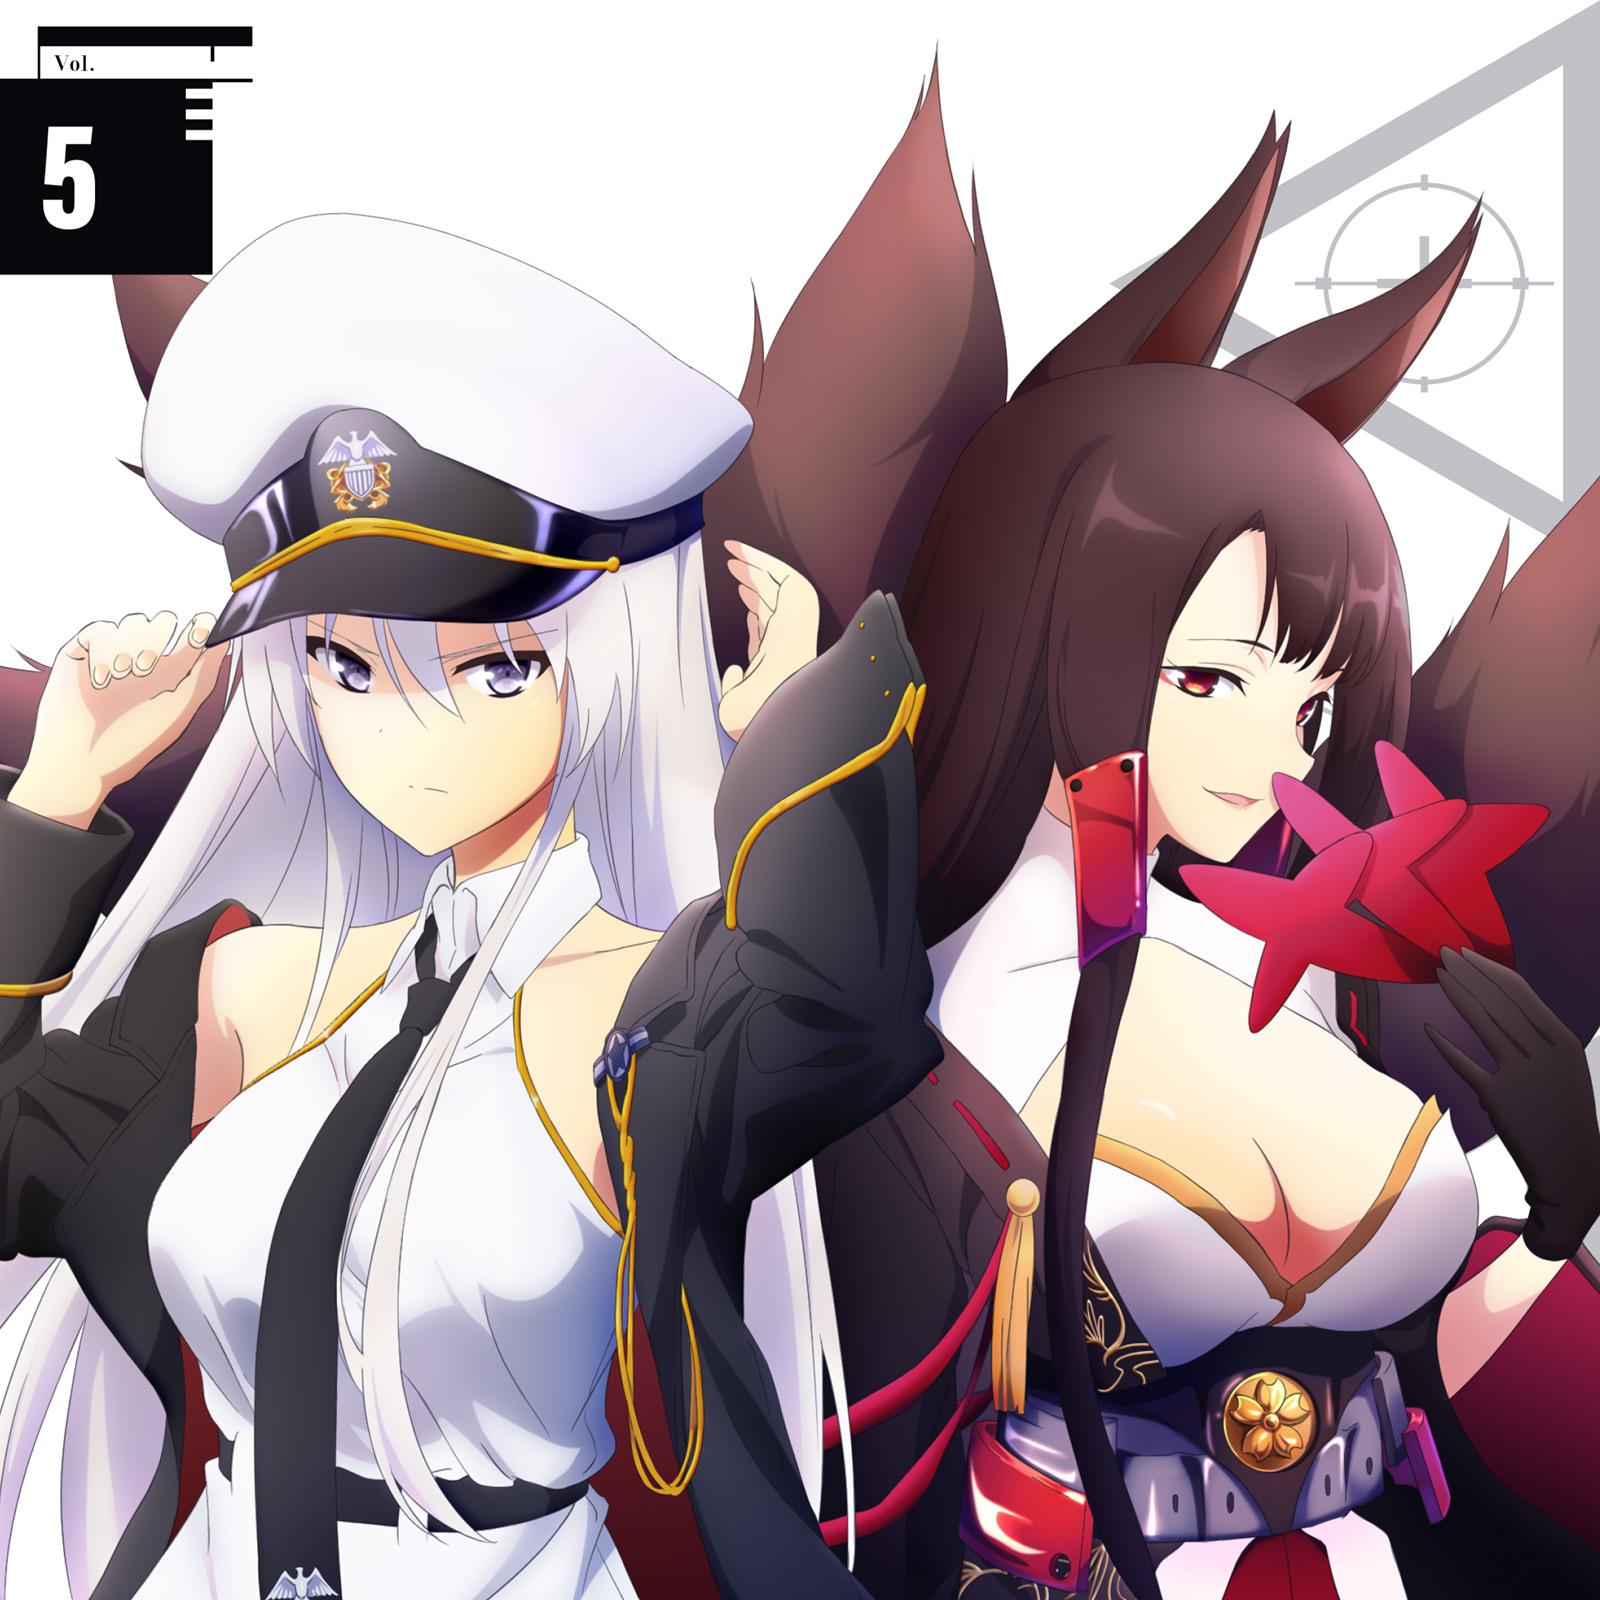 Azur Lane Buddy Character Song Single Vol.5 Enterprise & Akagi  アズールレーン バディキャラクターソングシングル Vol.5 エンタープライズ & 赤城